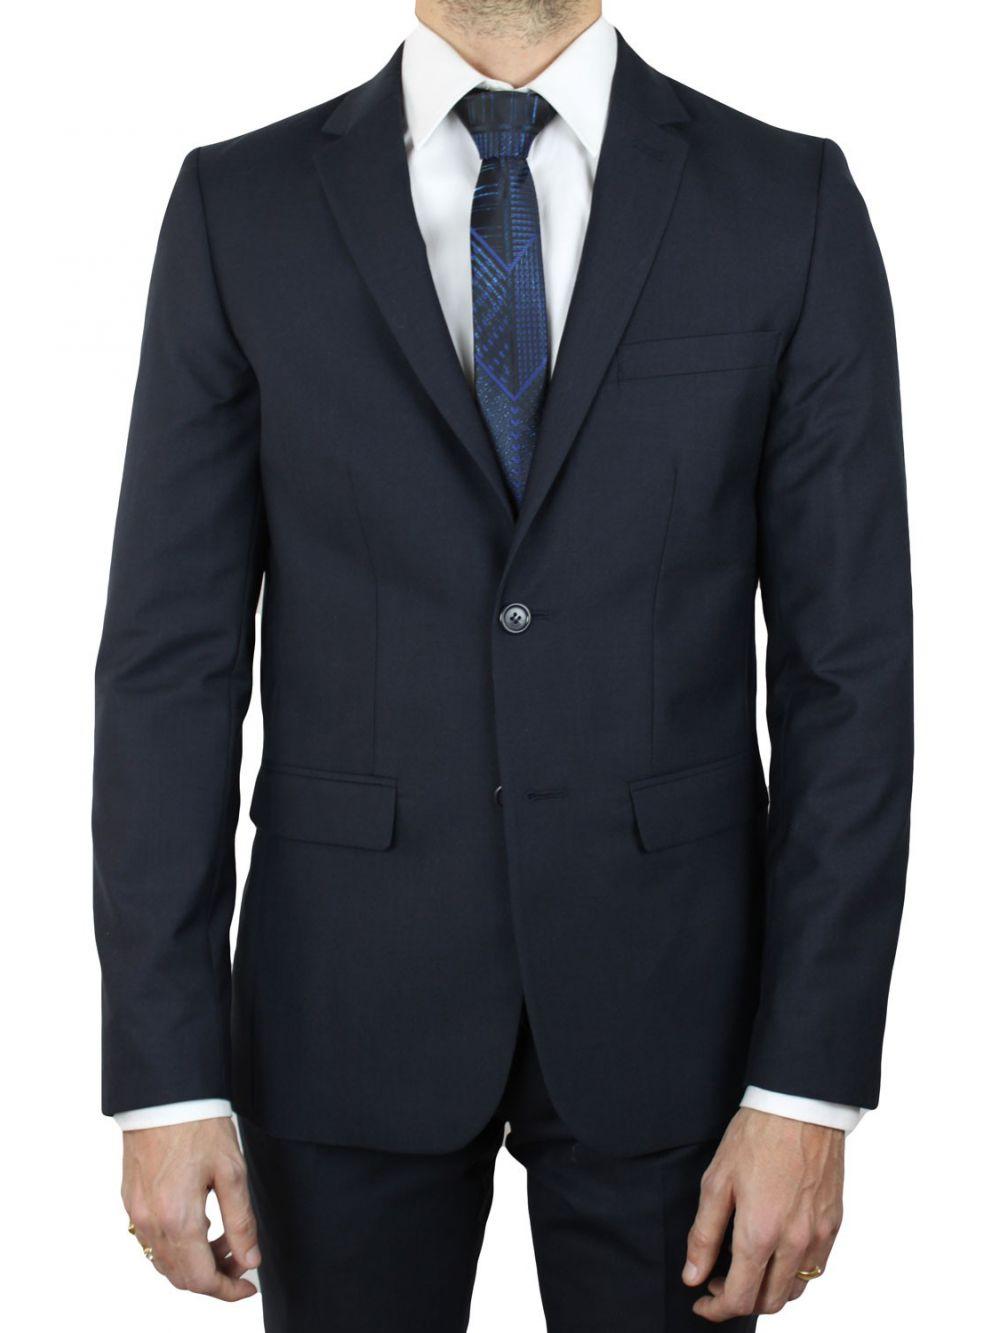 costume bleu marine 2 boutons pas cher costume homme kebello. Black Bedroom Furniture Sets. Home Design Ideas